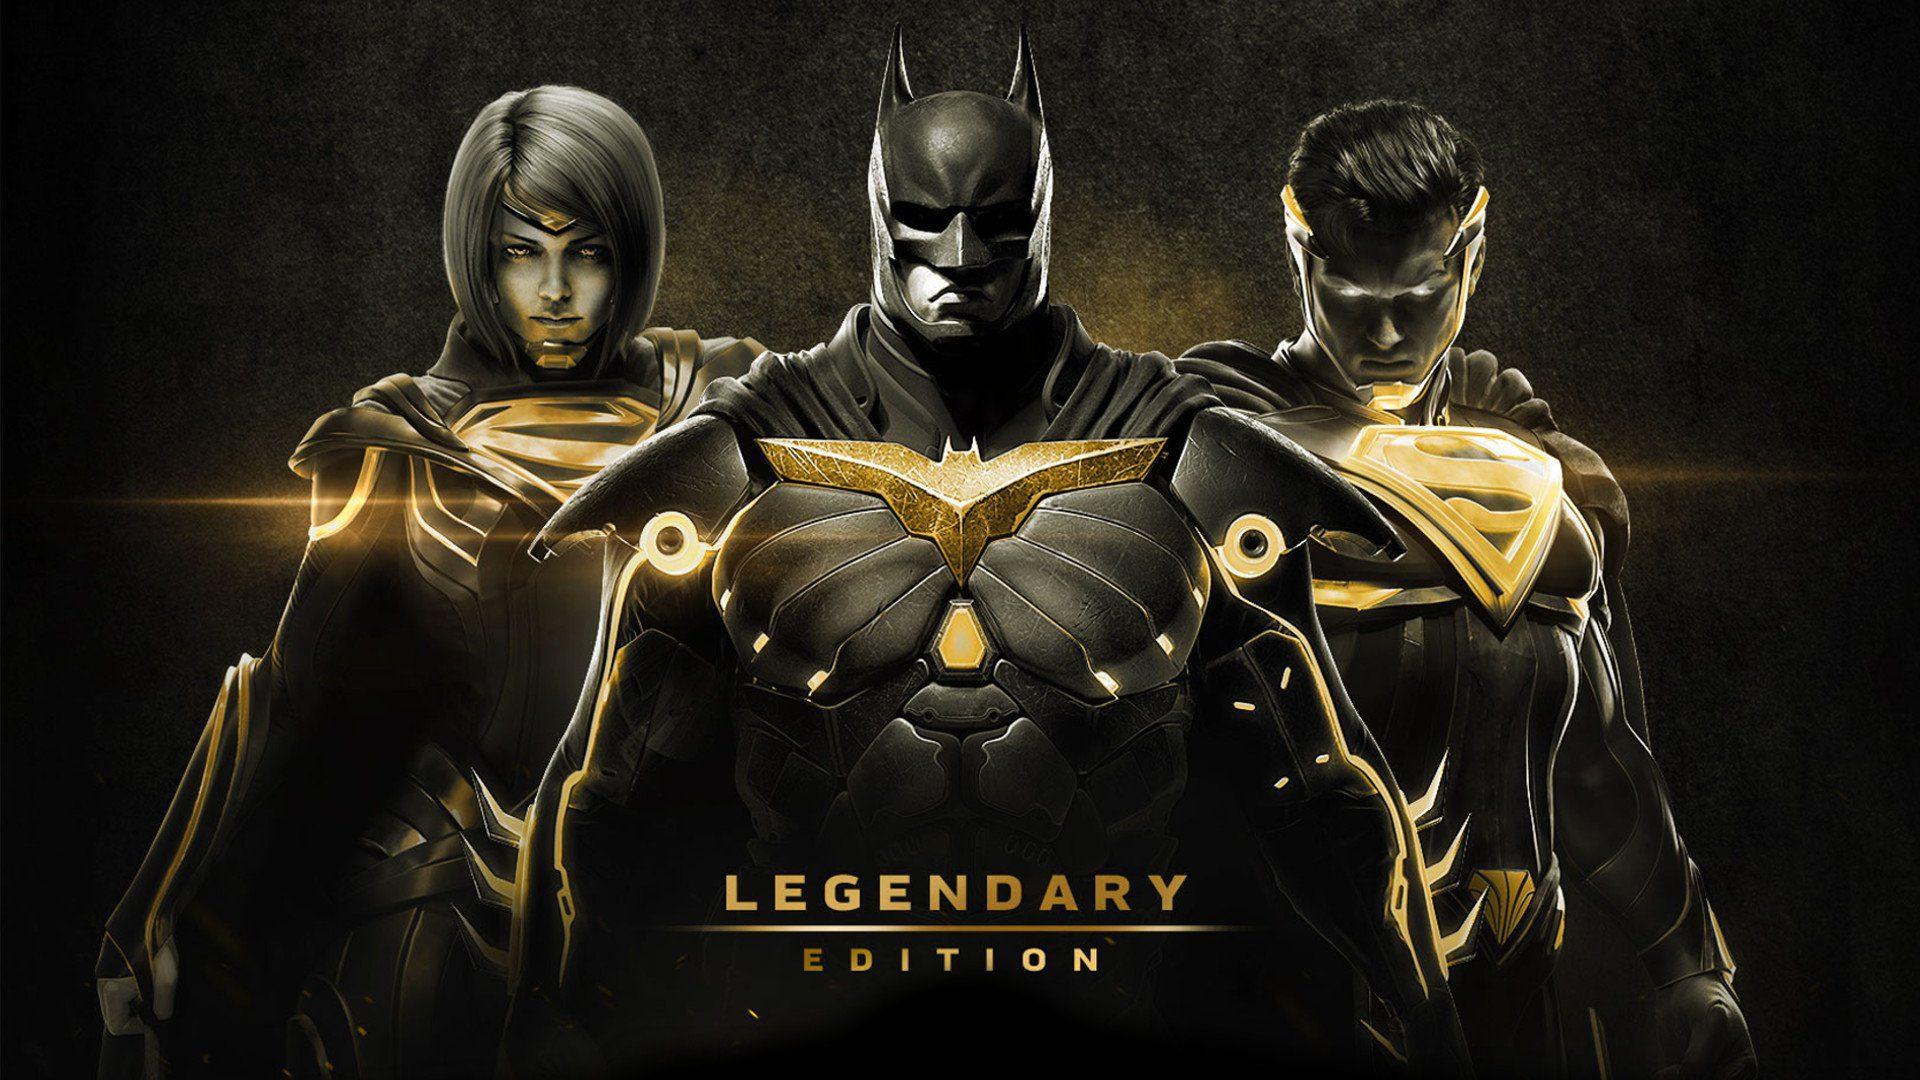 Análisis De Injustice 2 Legendary Edition